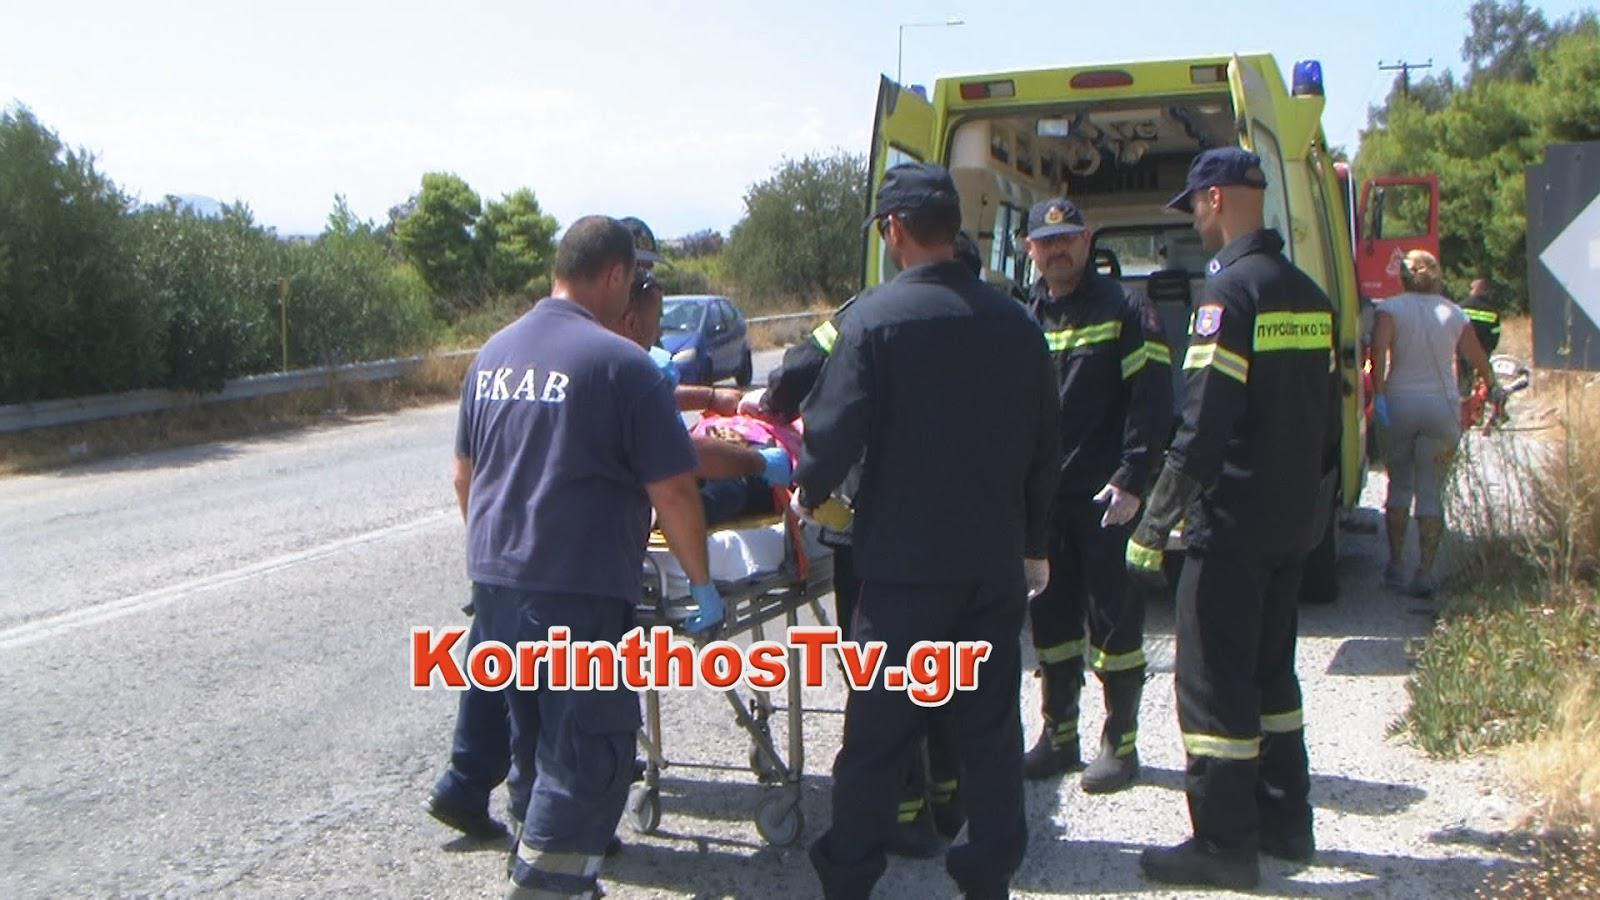 korinthos3_2 Γλίτωσαν από θαύμα καθώς το αυτοκίνητο τους έπεσε σε γκρεμό [εικόνες]